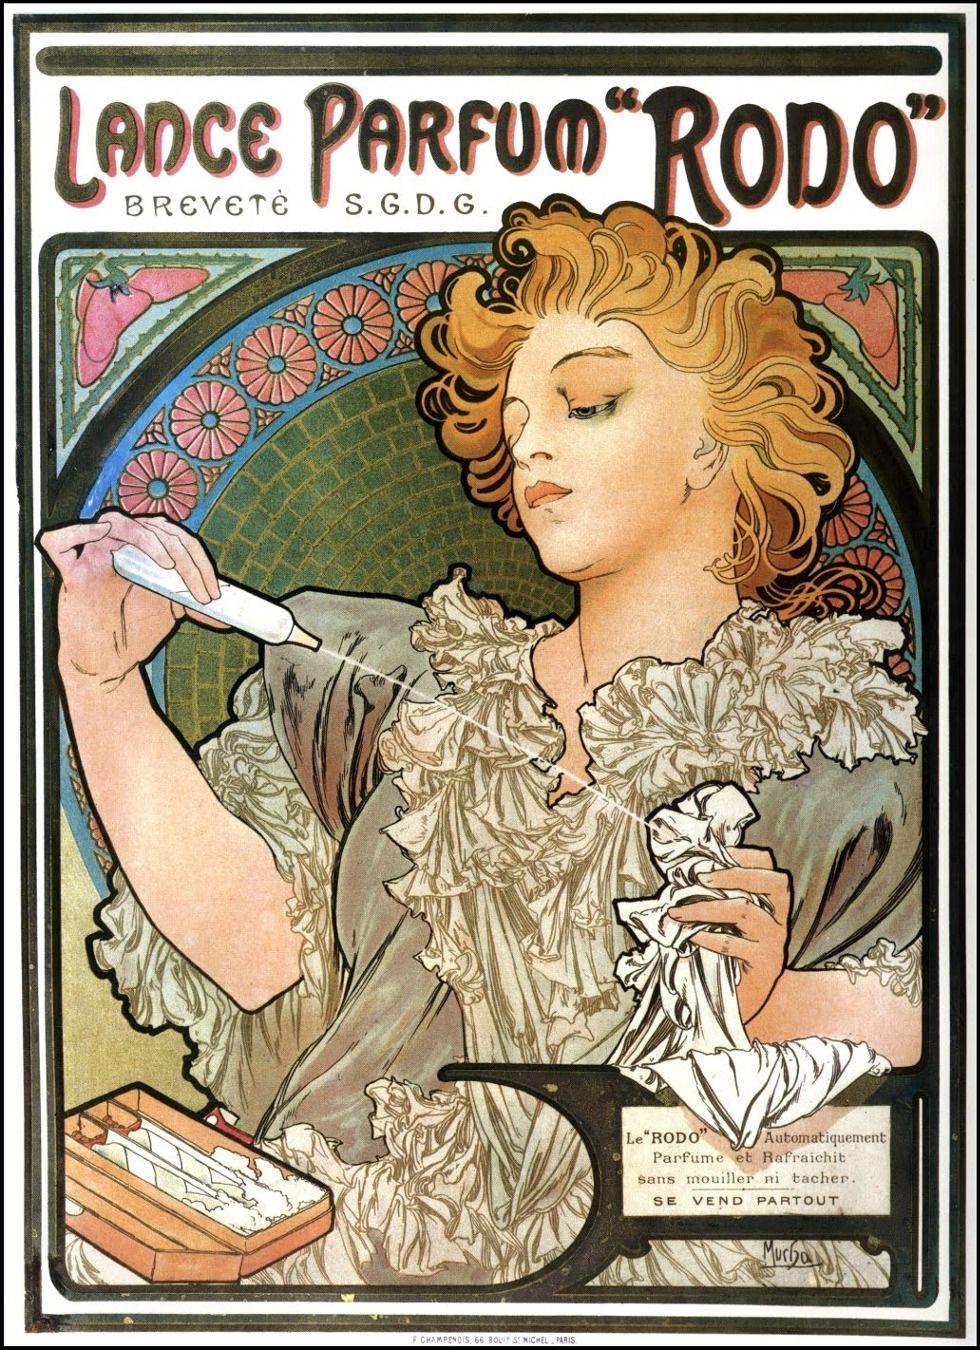 Perfume Ad Poster Illustrated By Alphonse Mucha 1896 ミュシャ